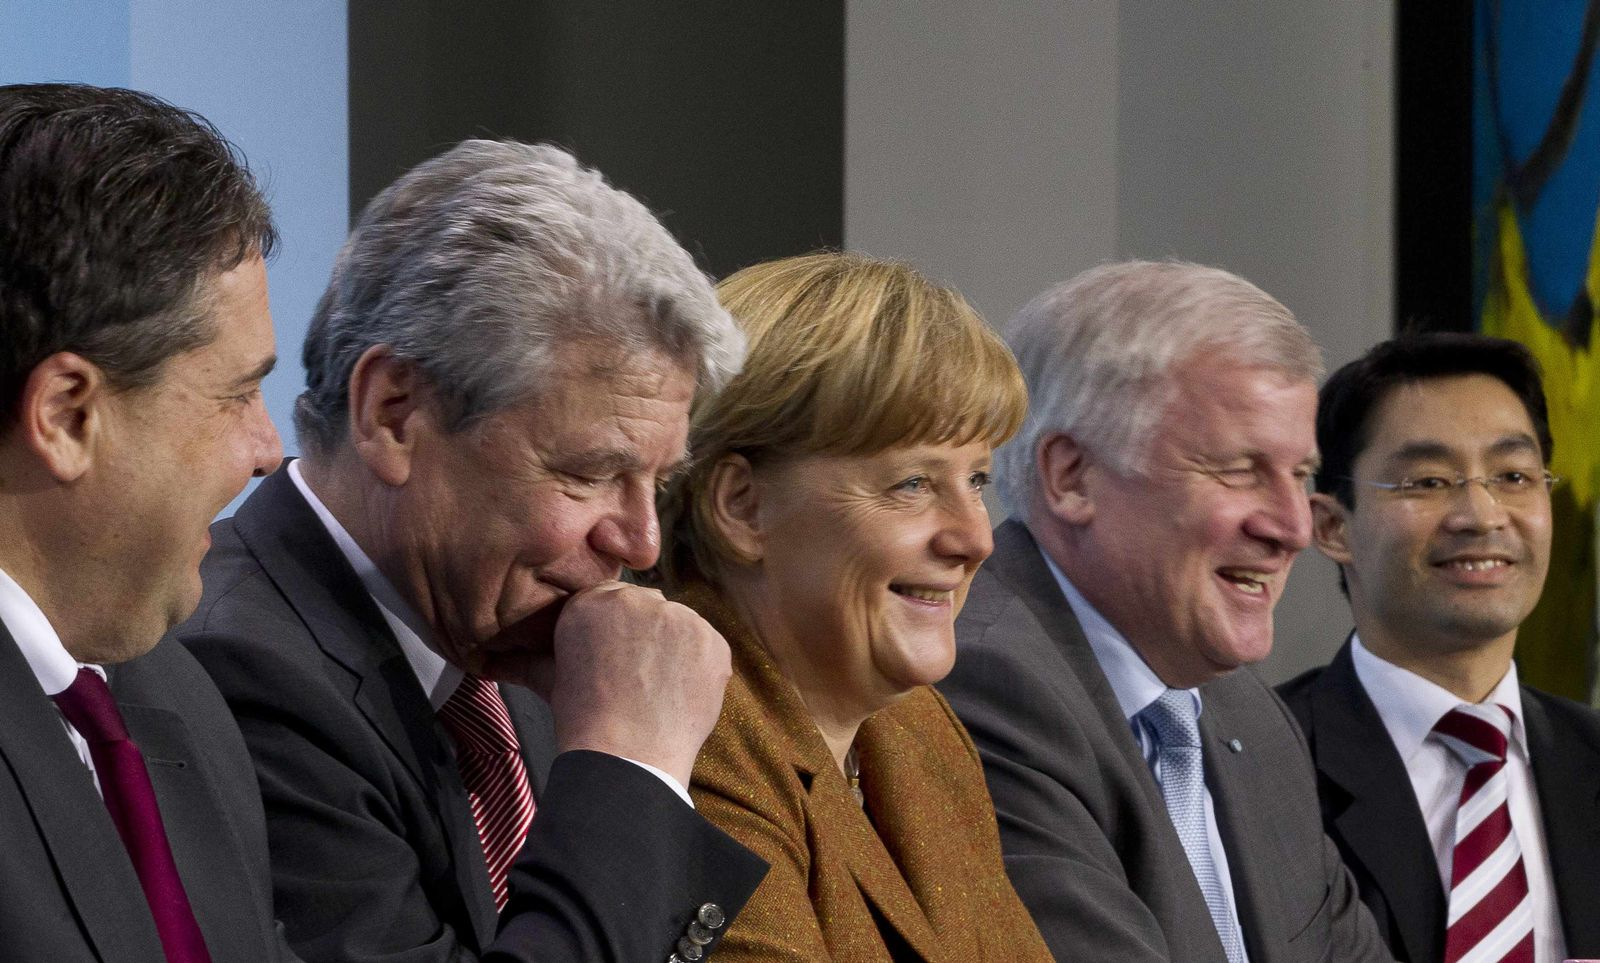 GERMANY-PRESIDENT/